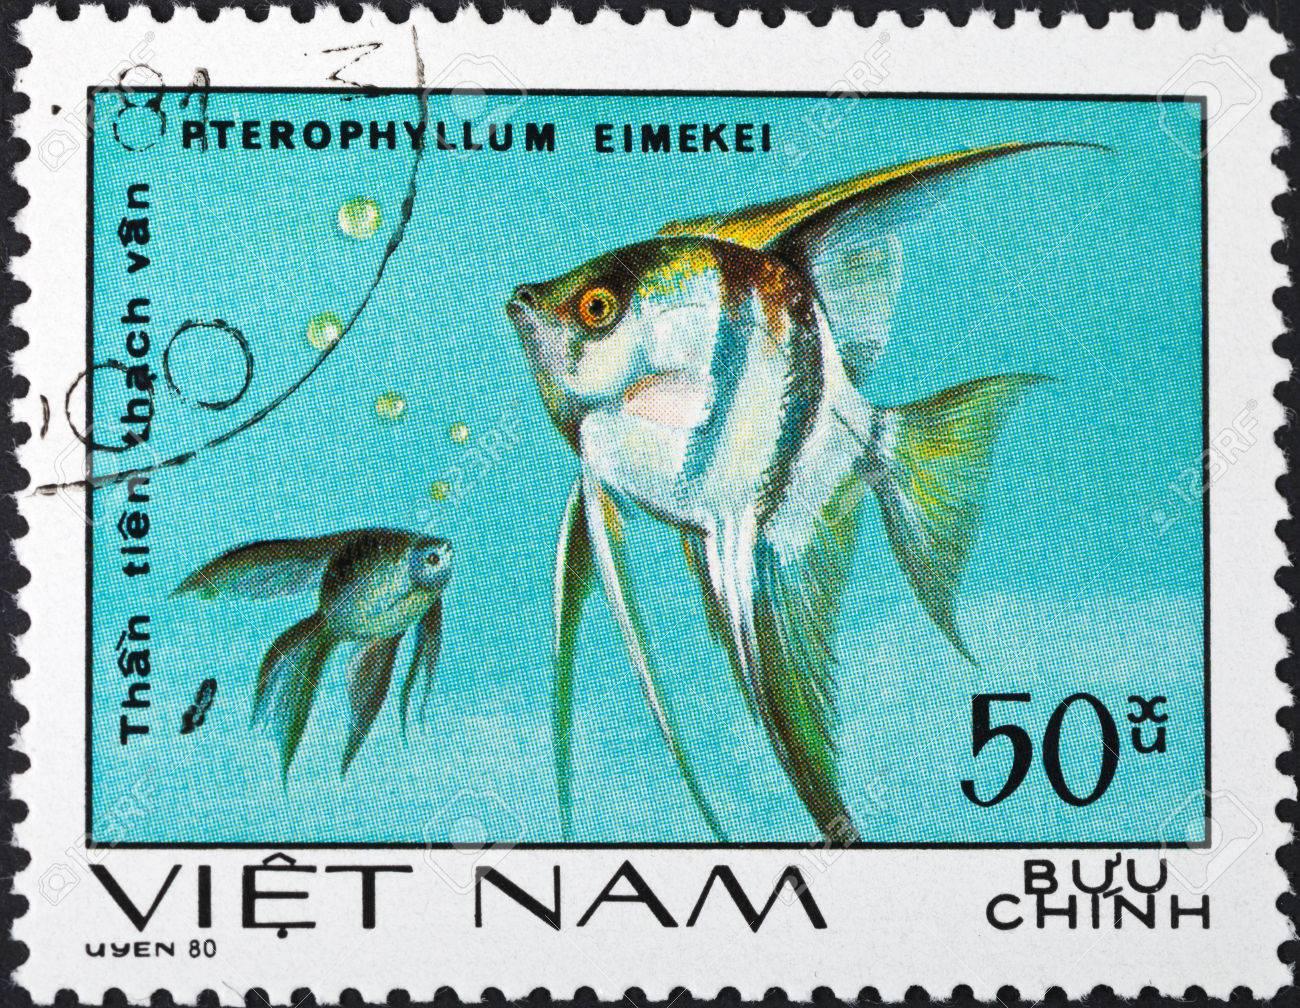 SOCIALIST REPUBLIC OF VIETNAM - CIRCA 1980: A postage stamp printed in the Vietnam shows pterophyllum eimekei - tropical angelfish, circa 1980 Stock Photo - 25386736